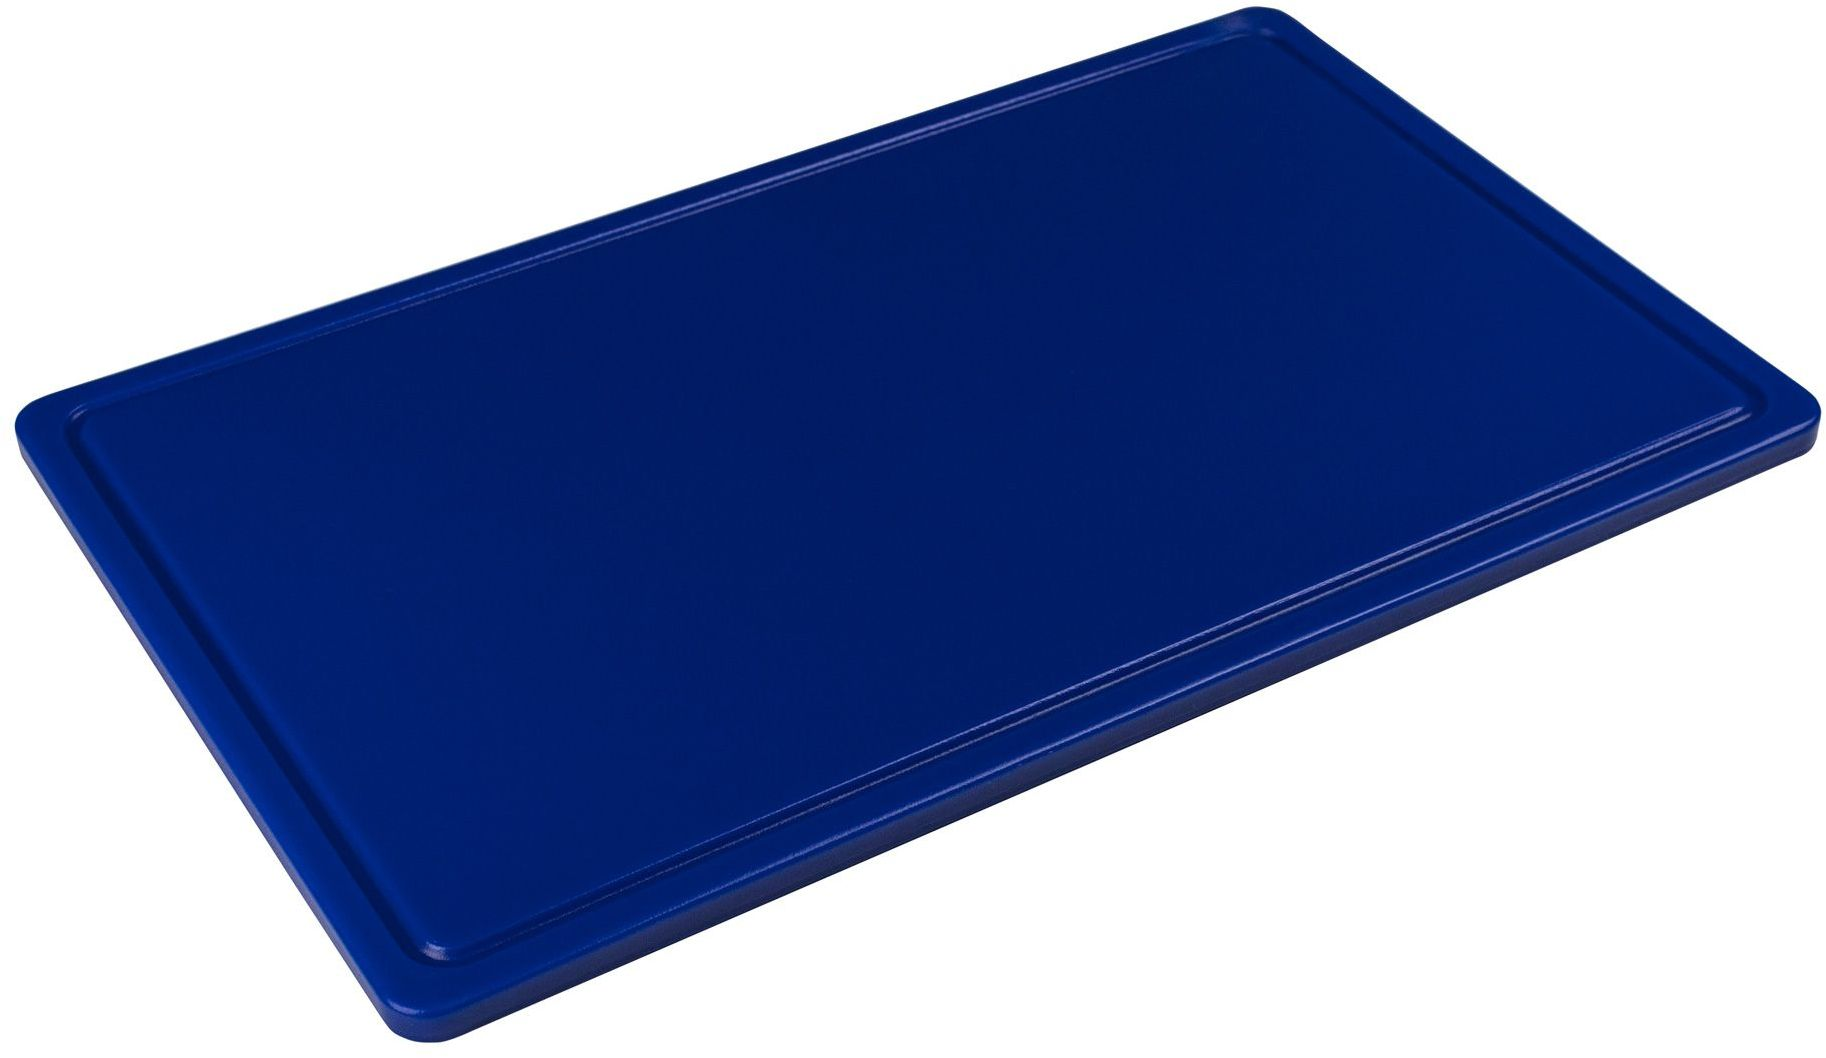 Deska z polietylenu HACCP niebieska